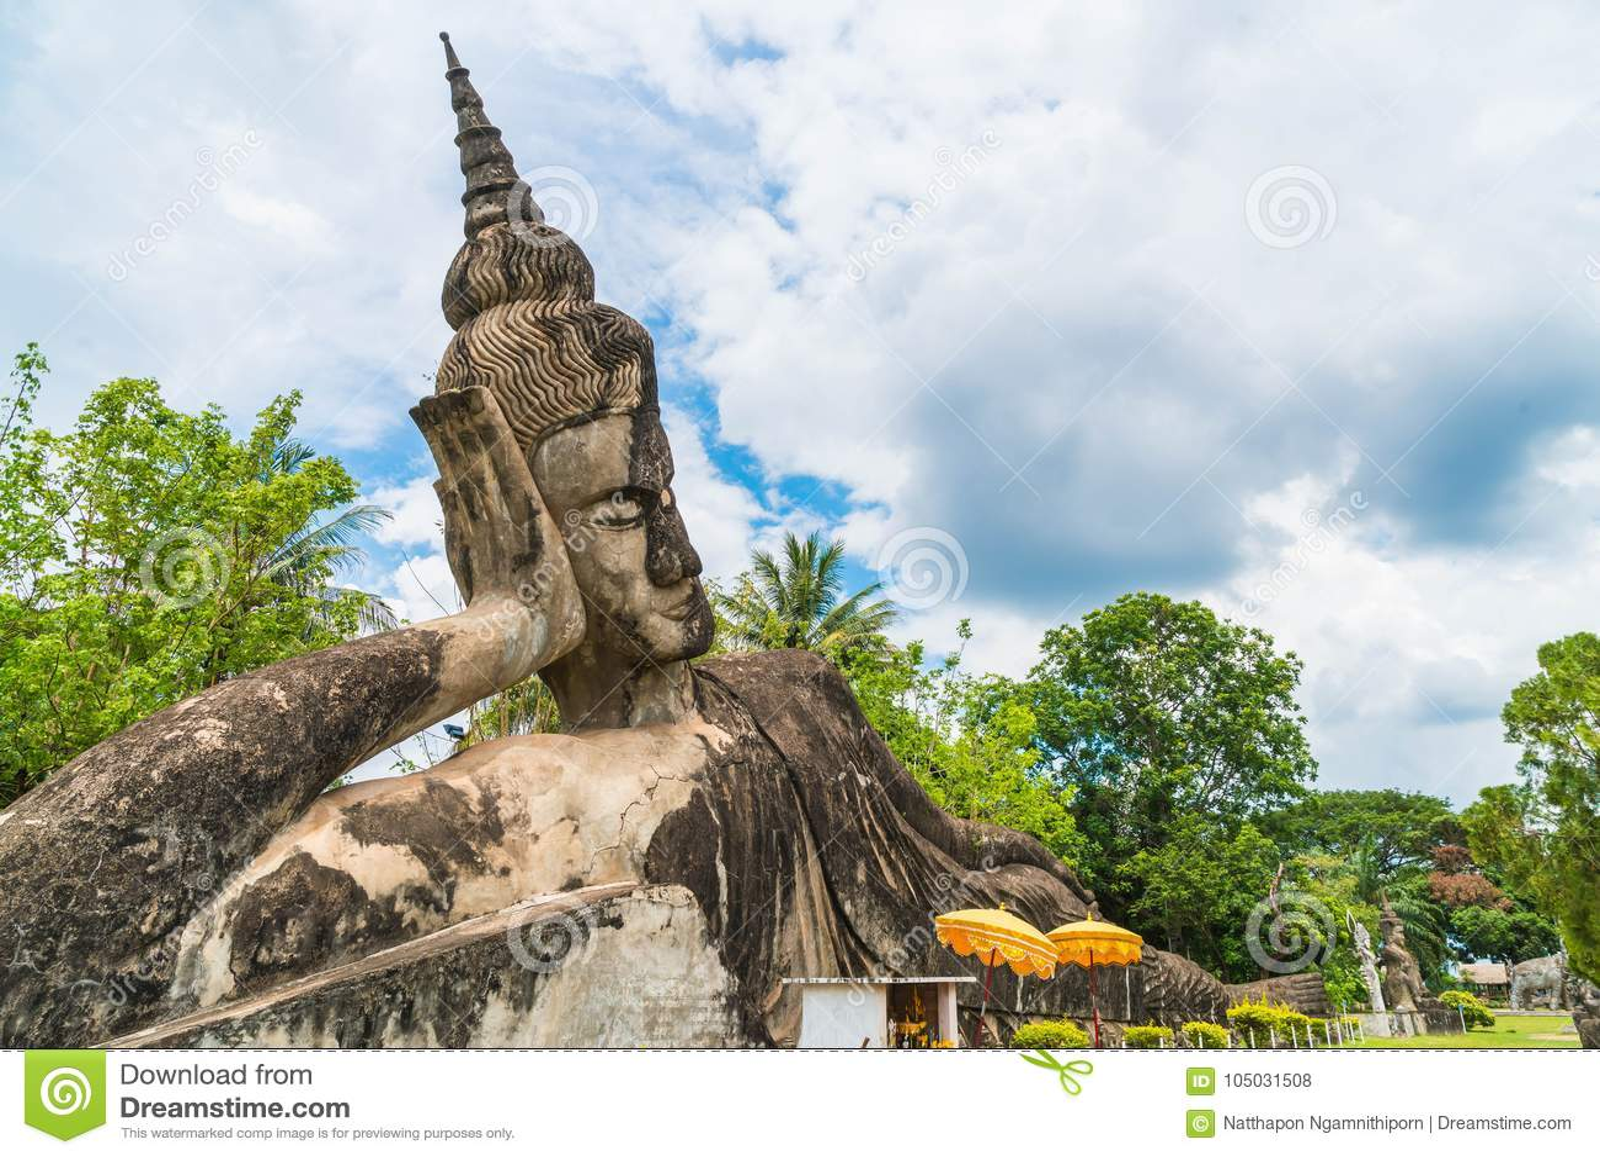 Bella architettura al parco di Buddha a Vientiane